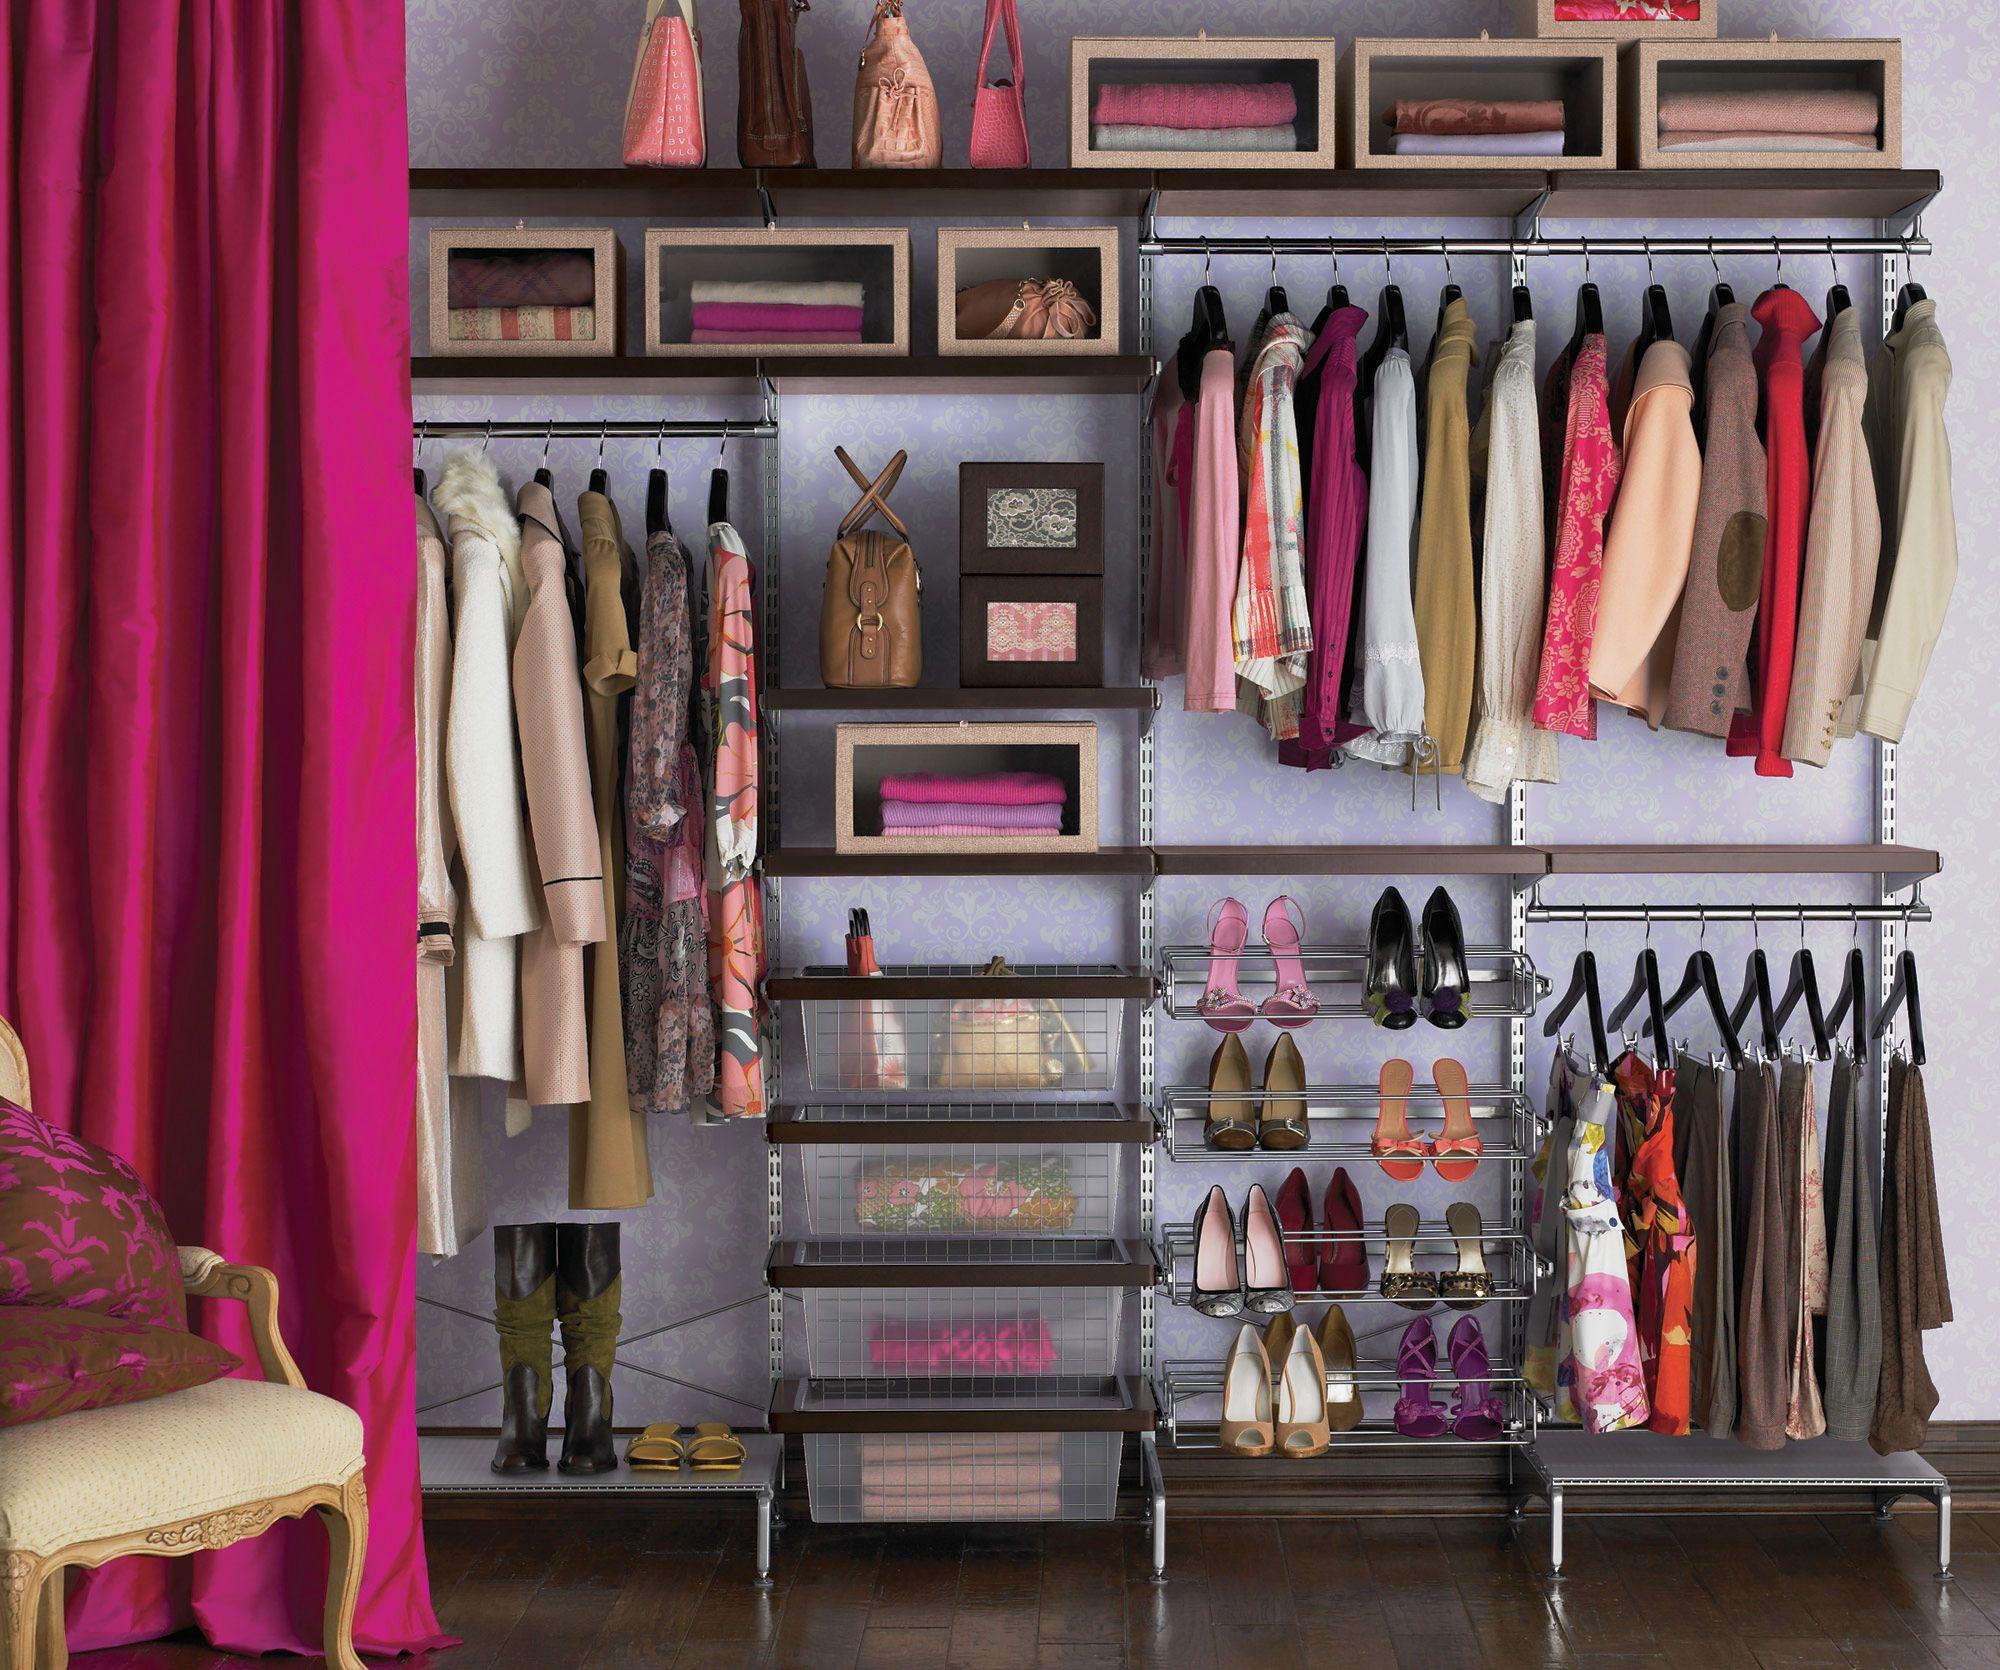 edu apartment com cortina pinterest closet fotos closets castello small pin